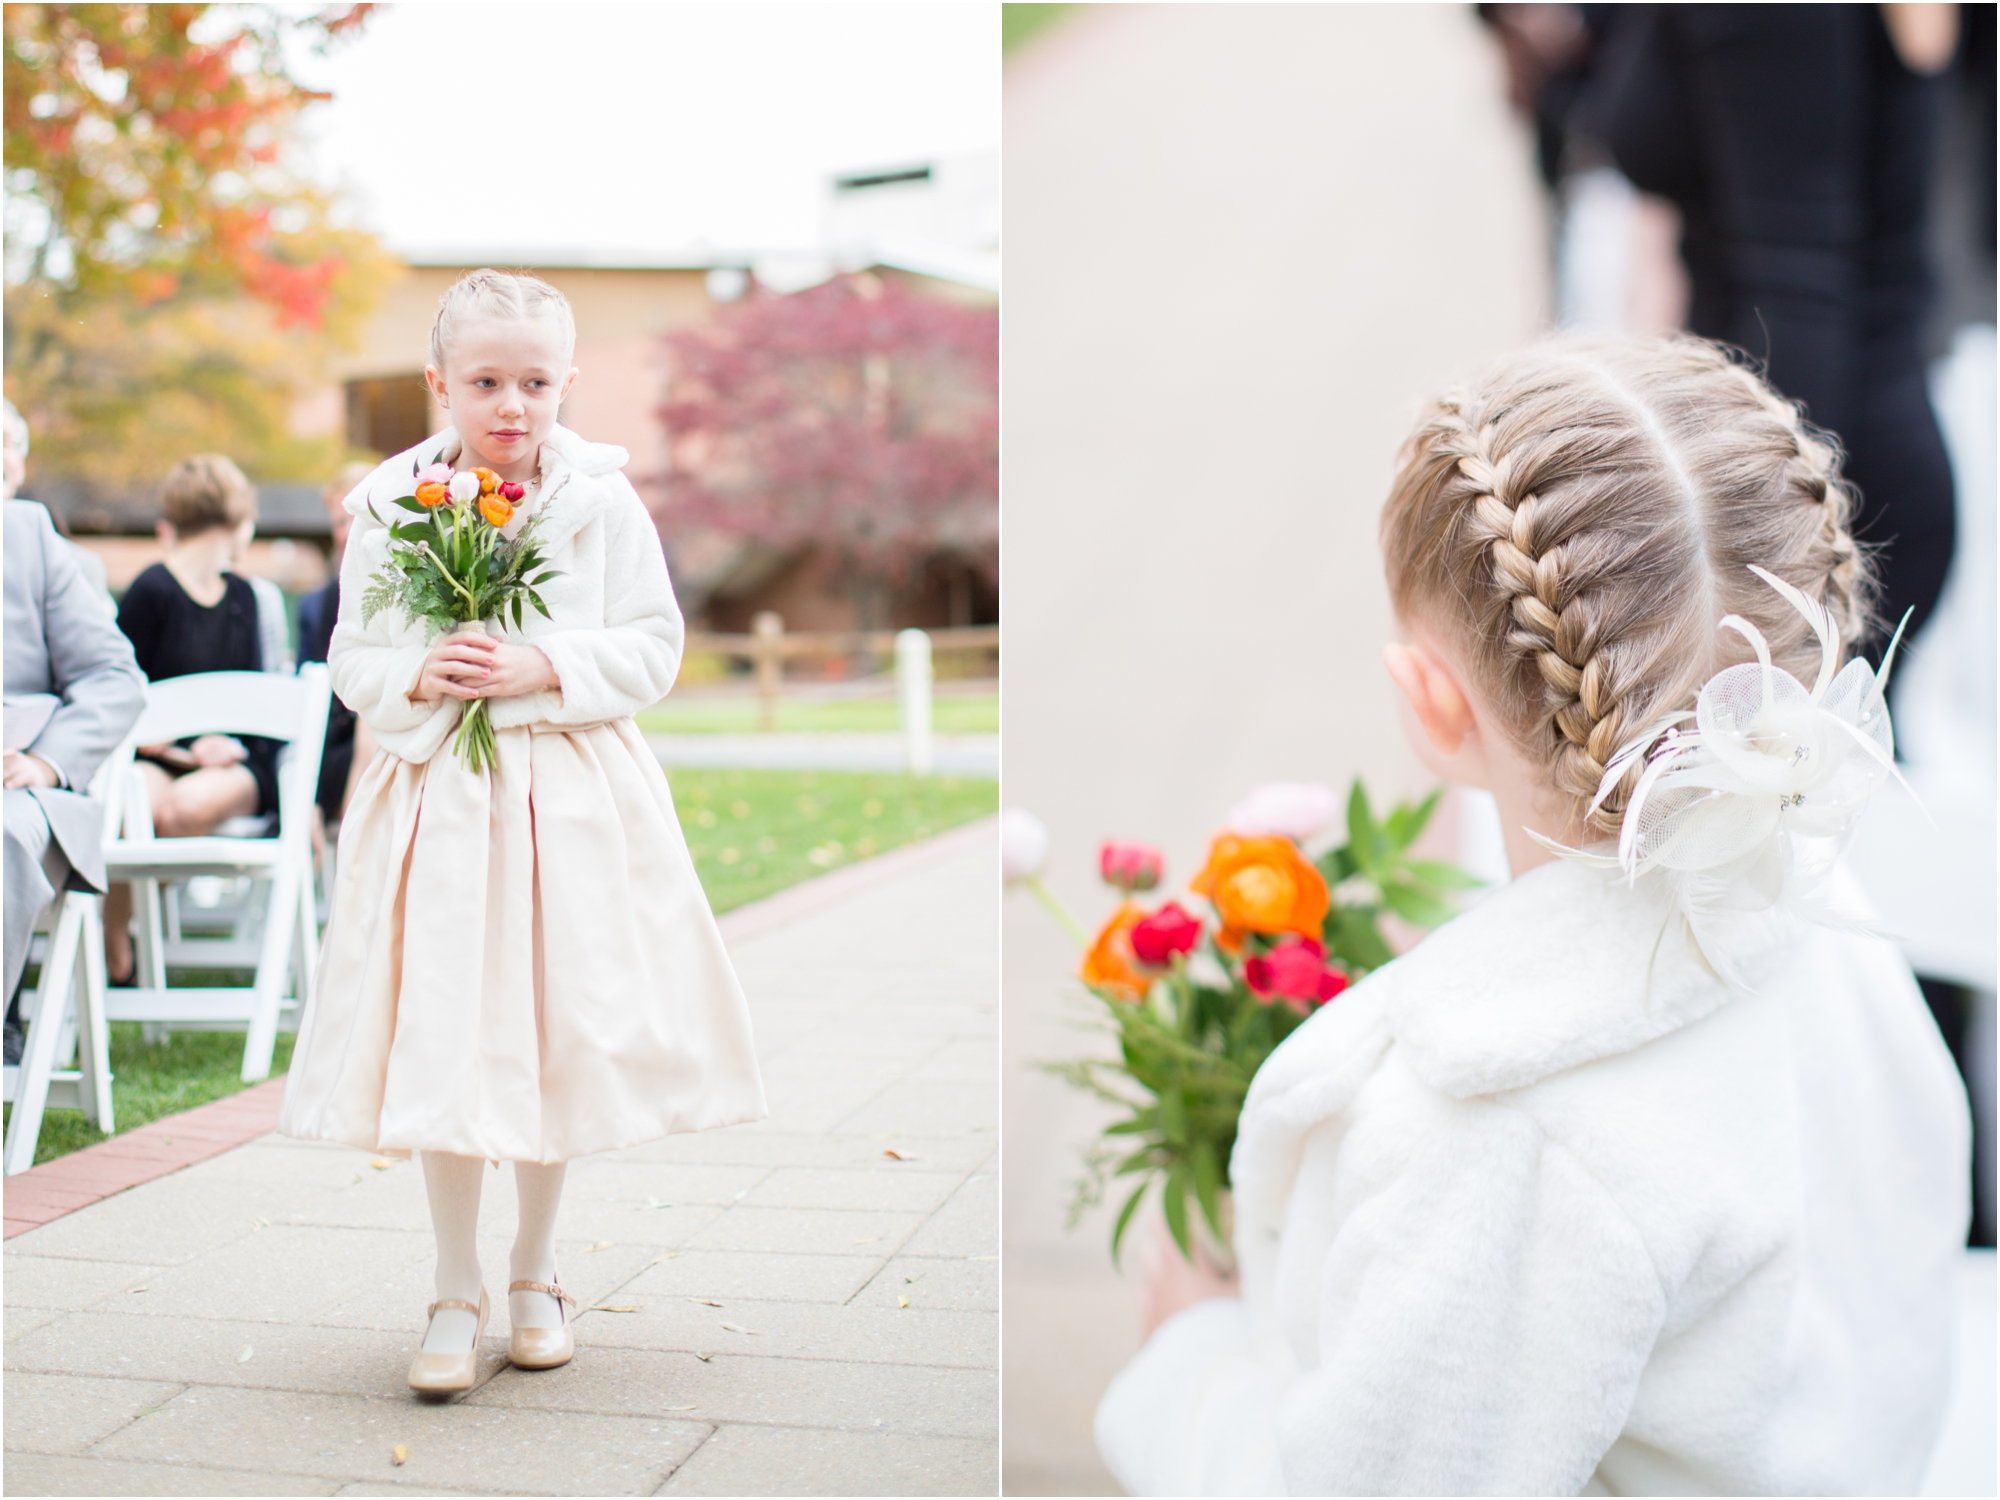 5-Finkel Wedding Ceremony-604_anna grace photography maryland wedding photographer turf valley.jpg